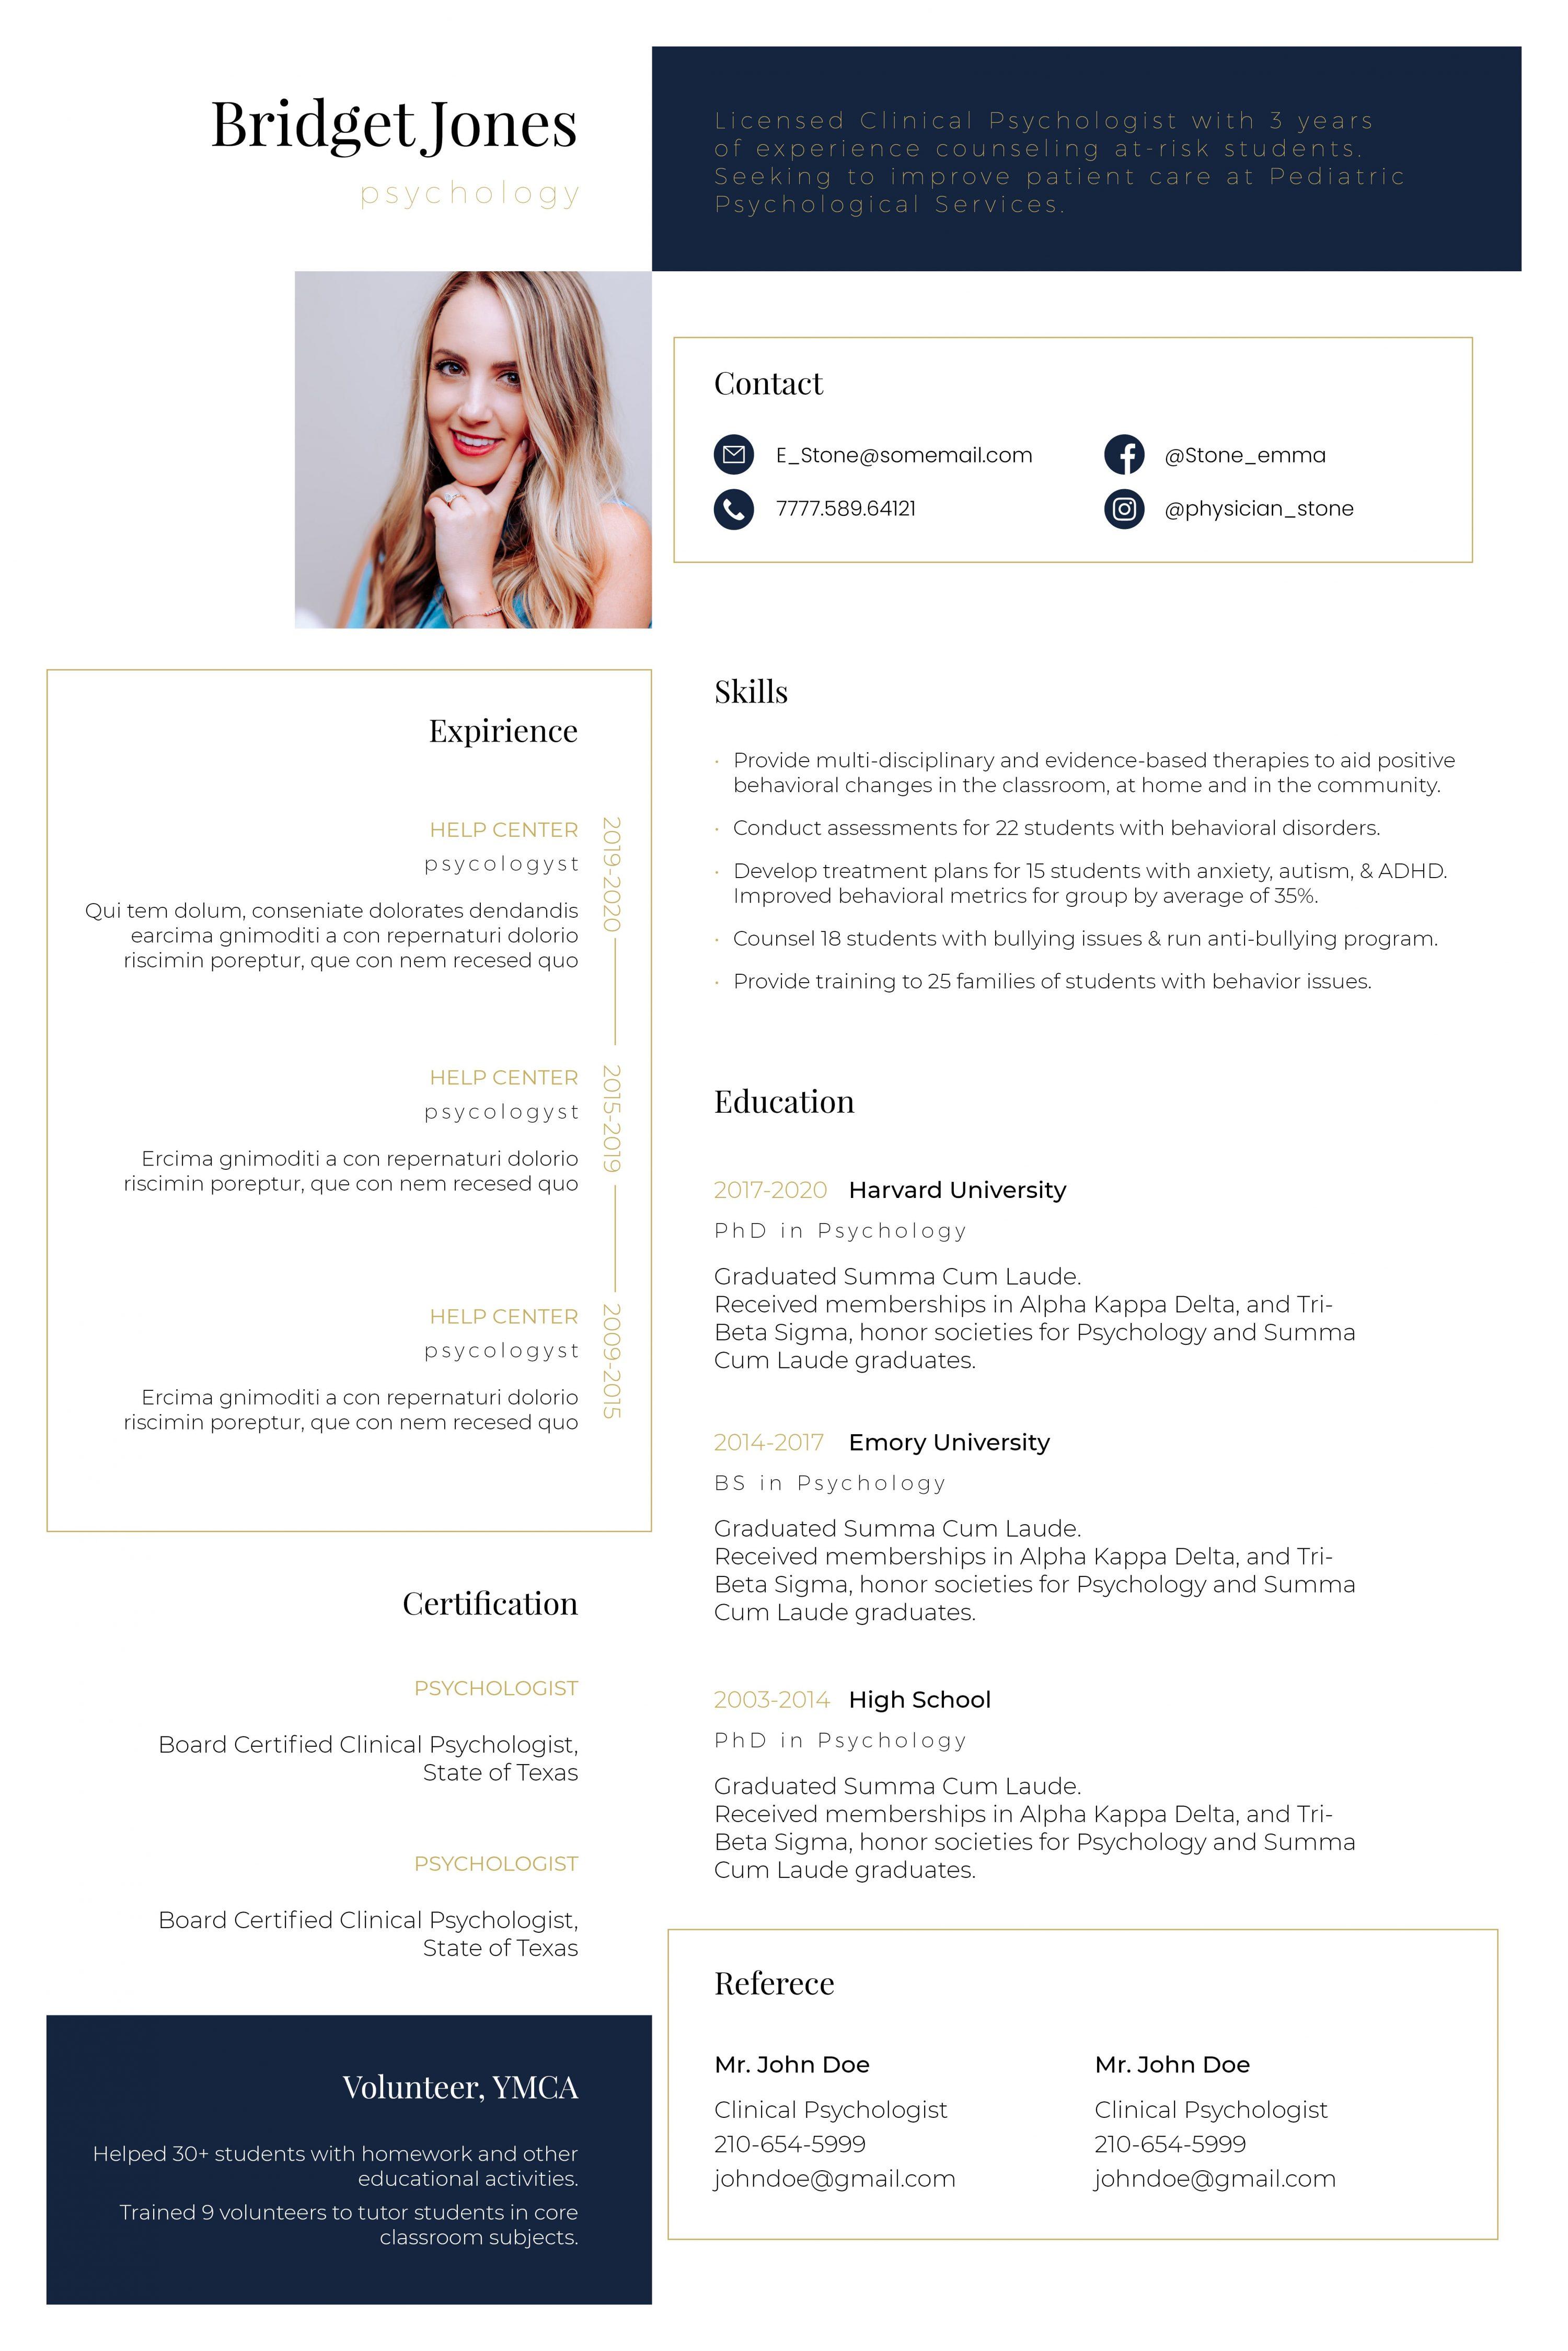 Nursing & Medical Resume Templates InDesign Bundle - Resume template phycology 1